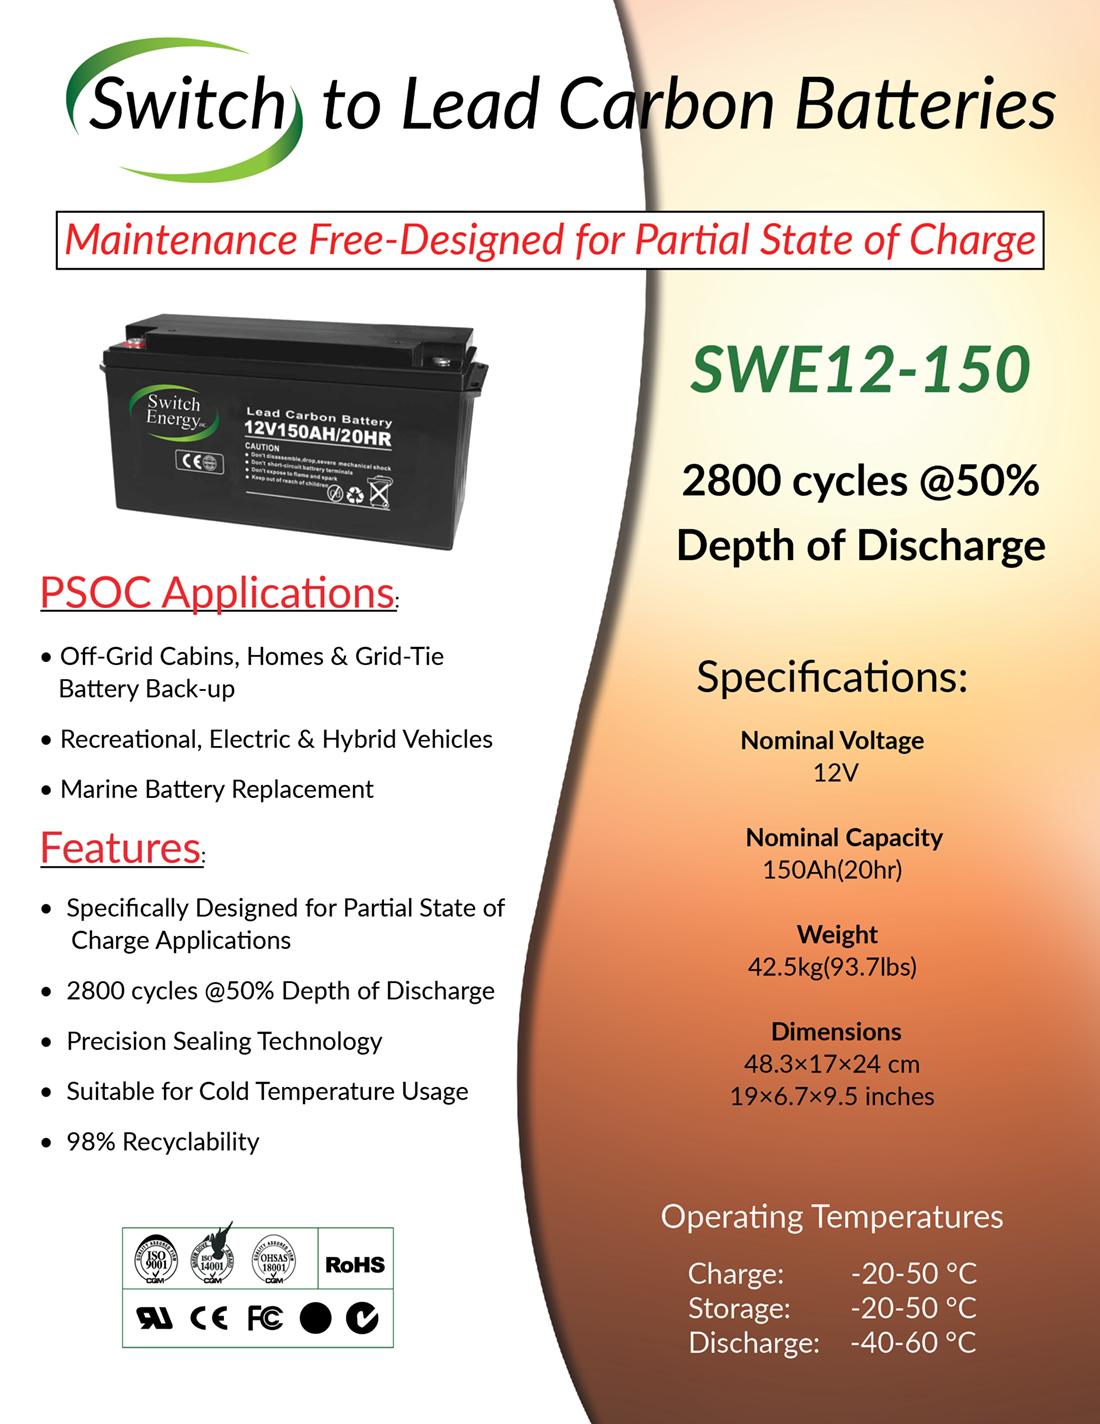 12V 150Ah lead carbon batteries